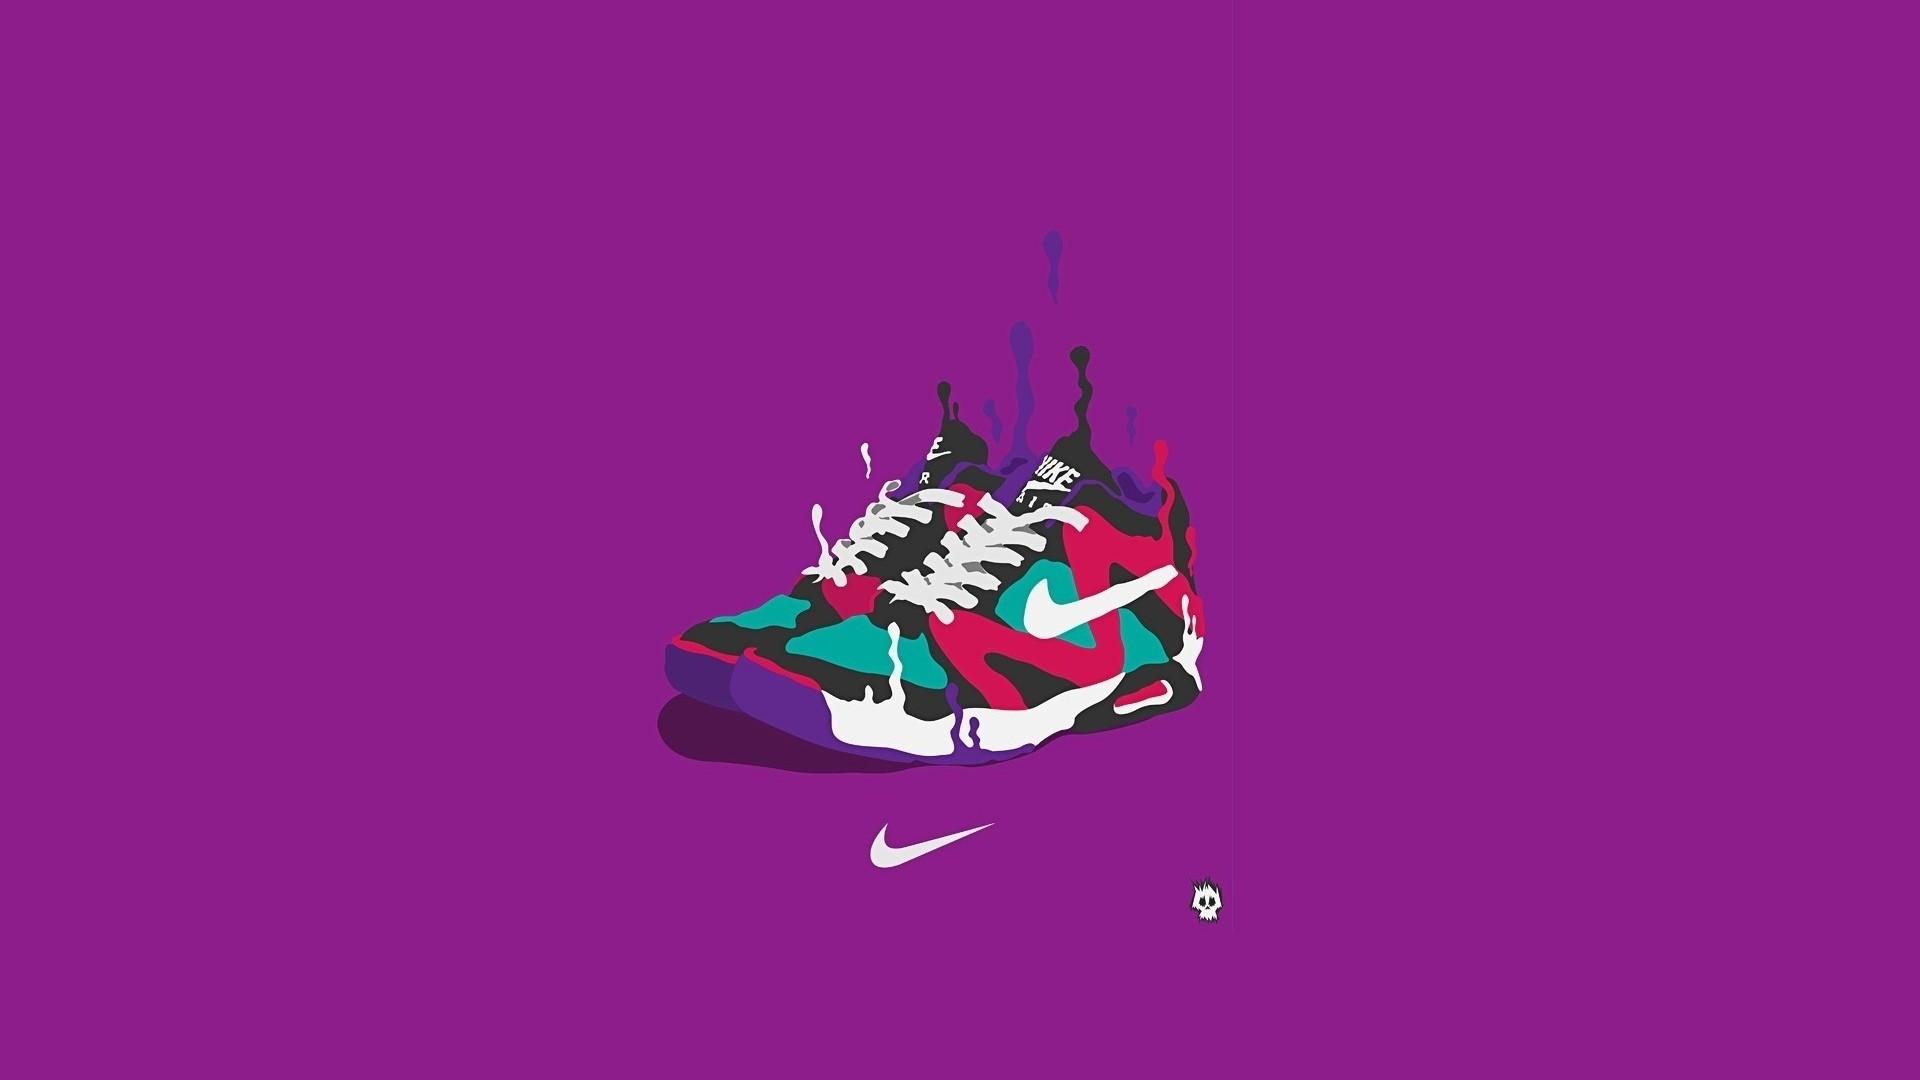 Res: 1920x1080, Nike Wallpaper